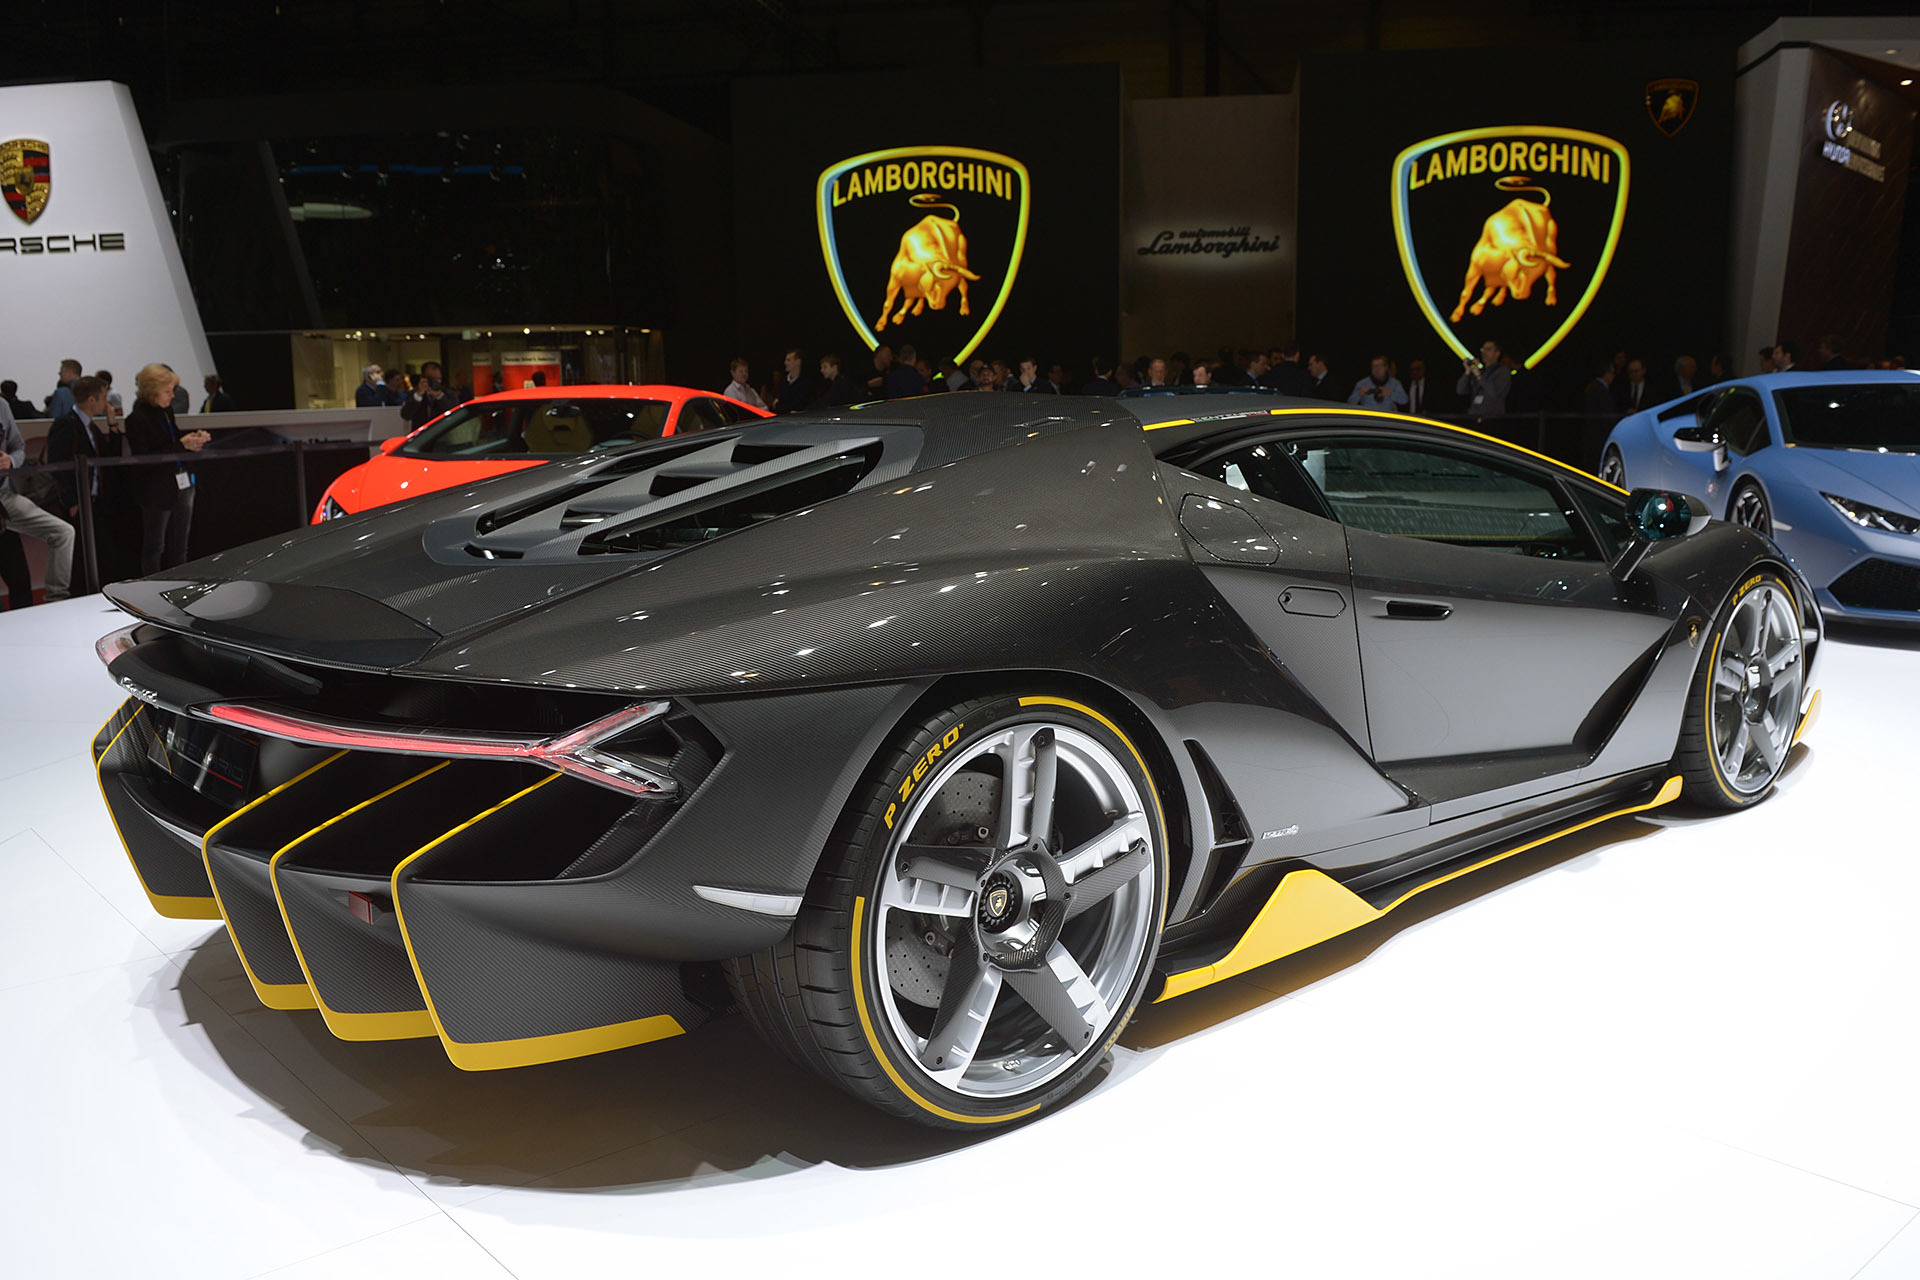 Lamborghini Centenario Roadster 770hp 1 Of 20 2 Million